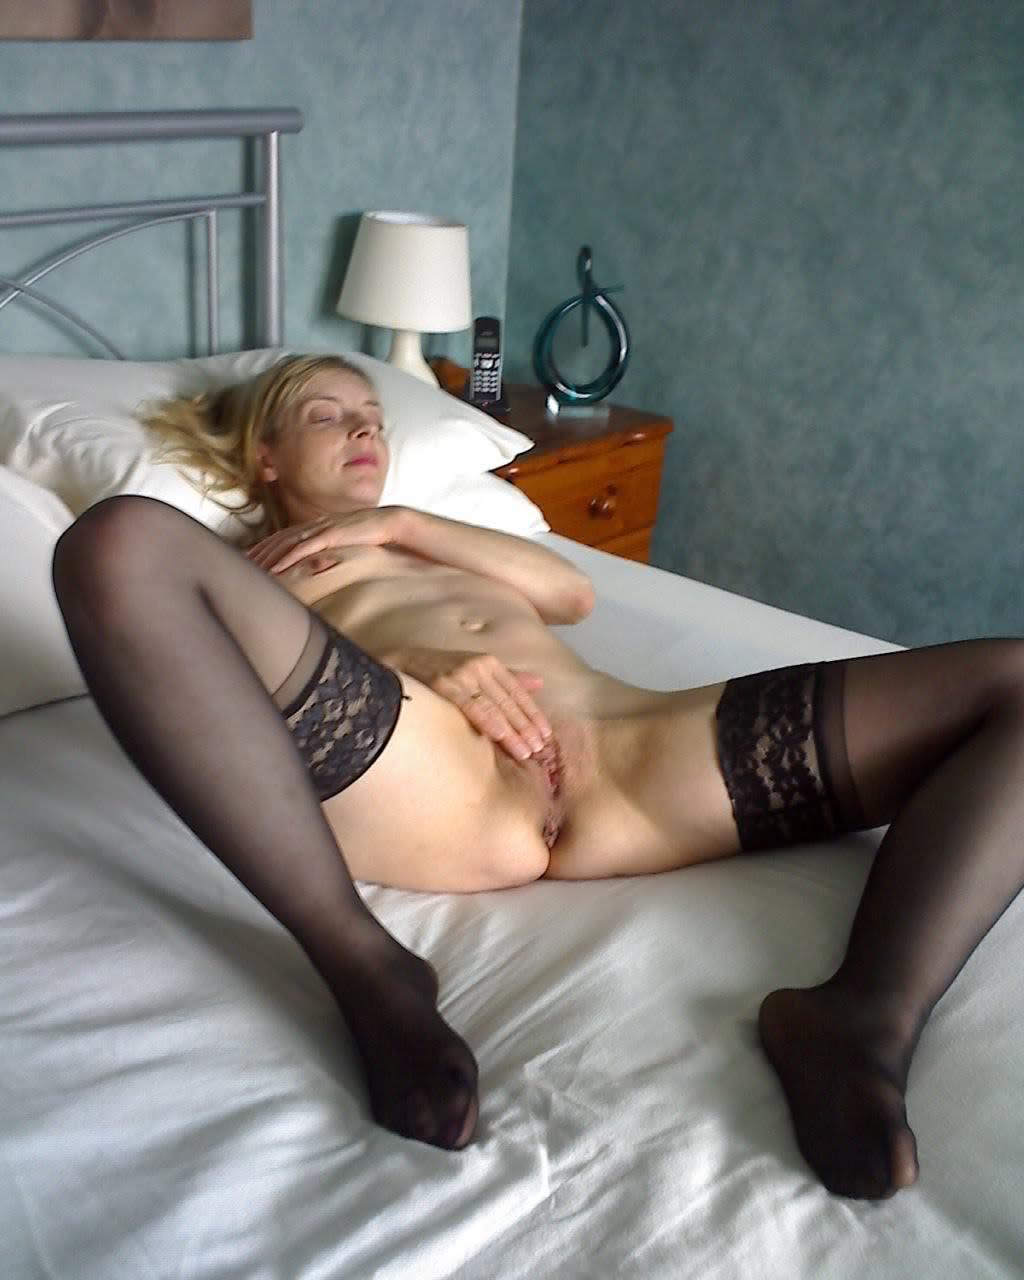 real brazilian girls nude pics